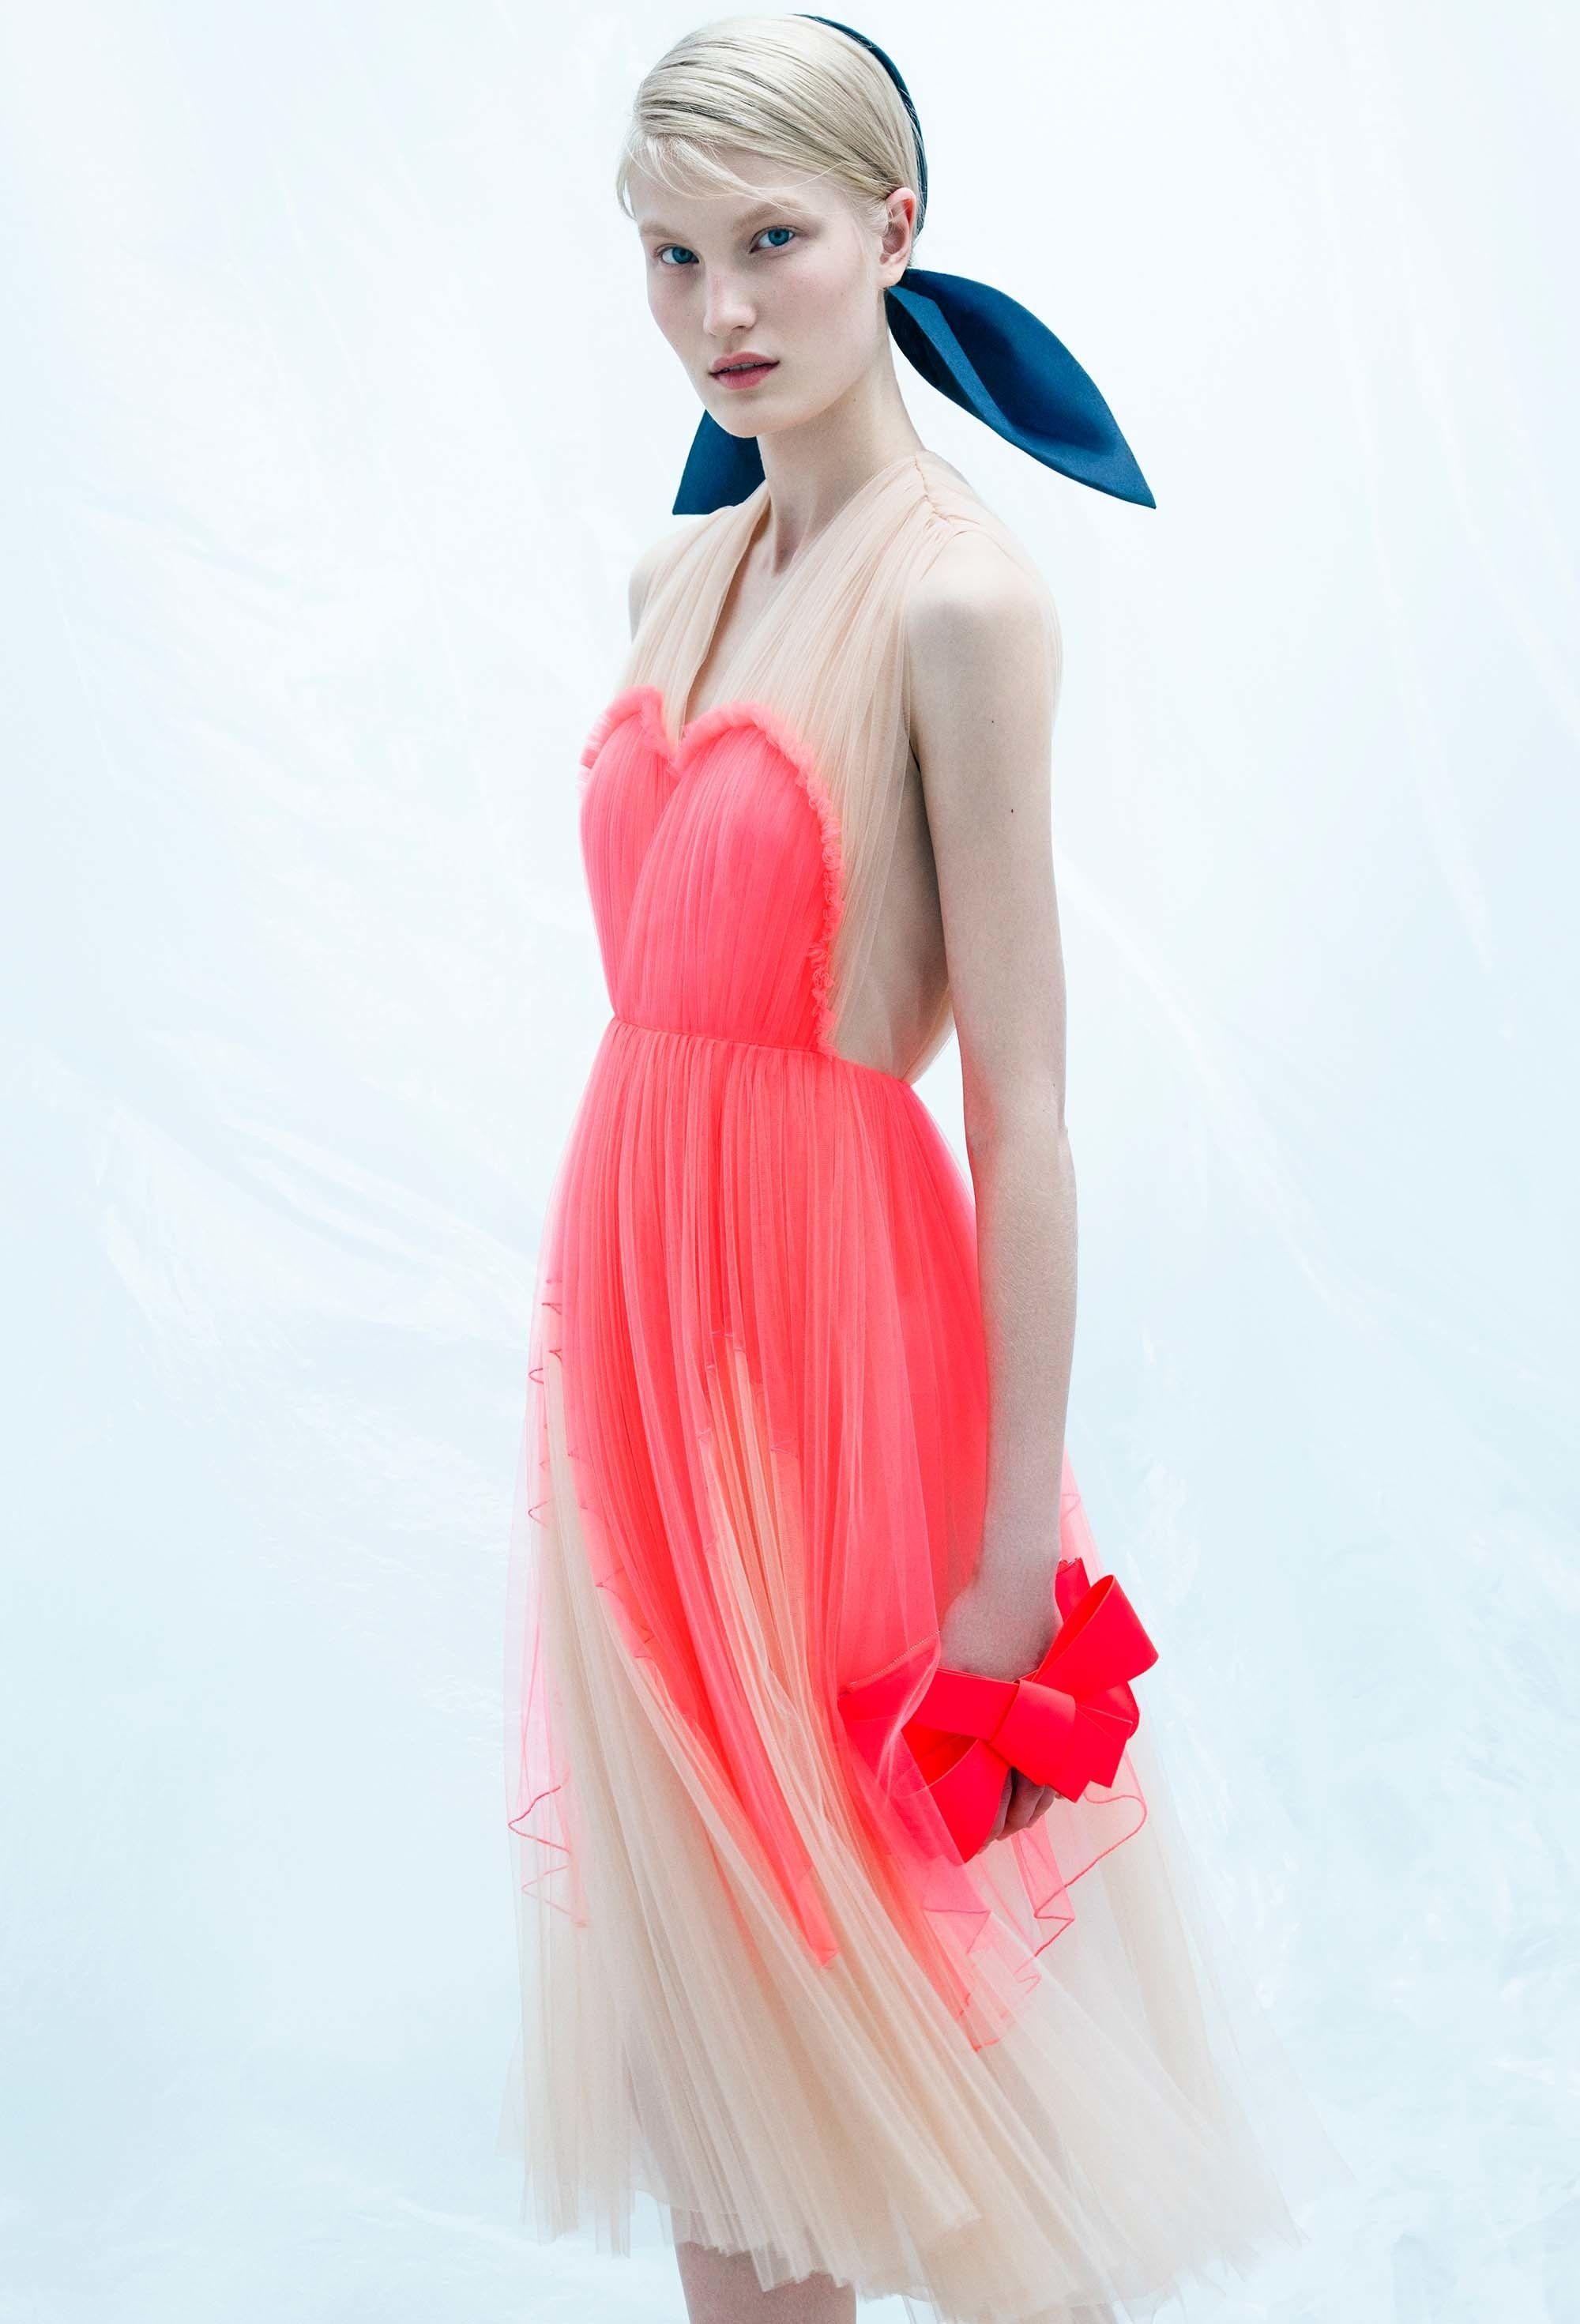 Delpozo resort fashion show resorts photos and fashion